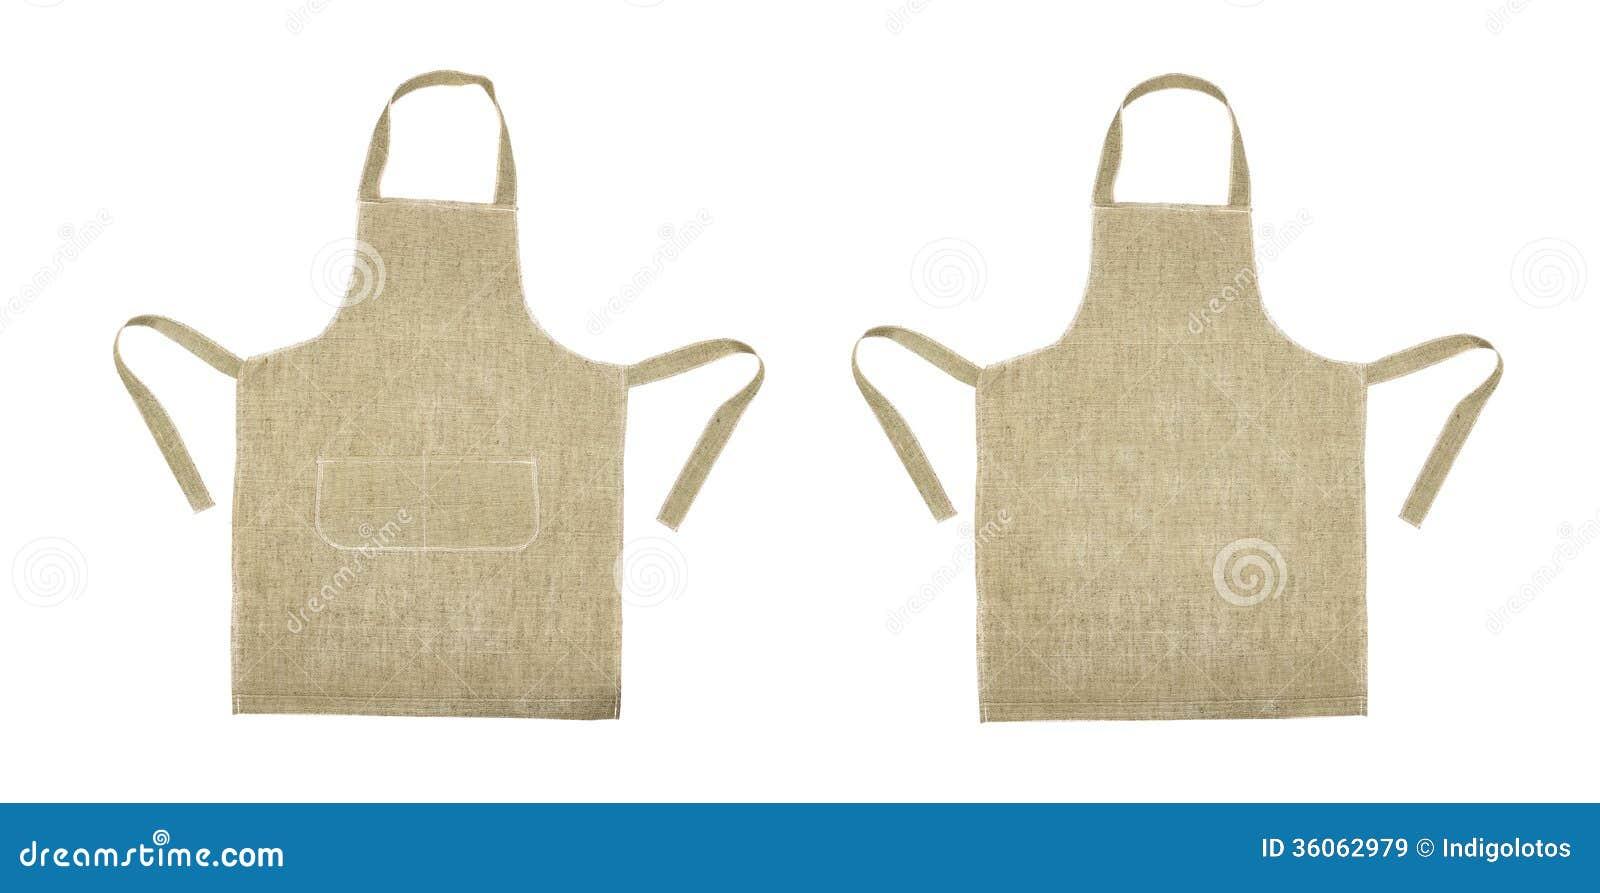 White apron kitchen - Kitchen Gray Apron Front And Back View